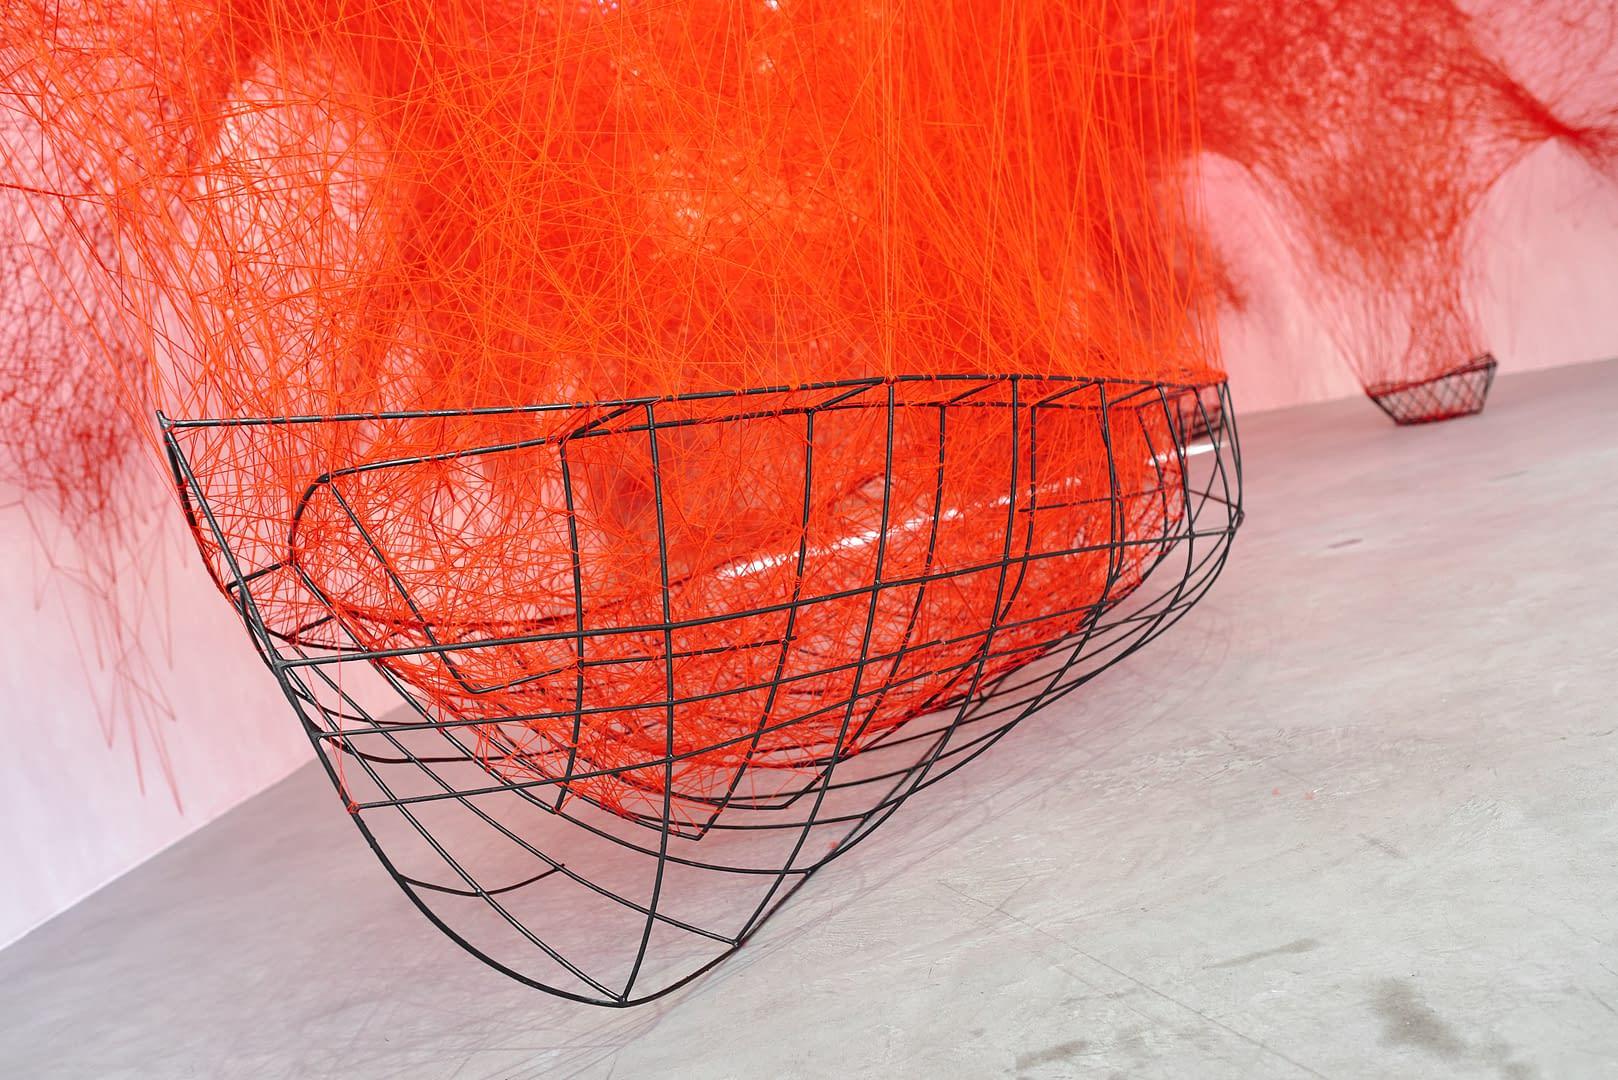 Chiharu Shiota at BlainSouthern für ArtBerlin 0100